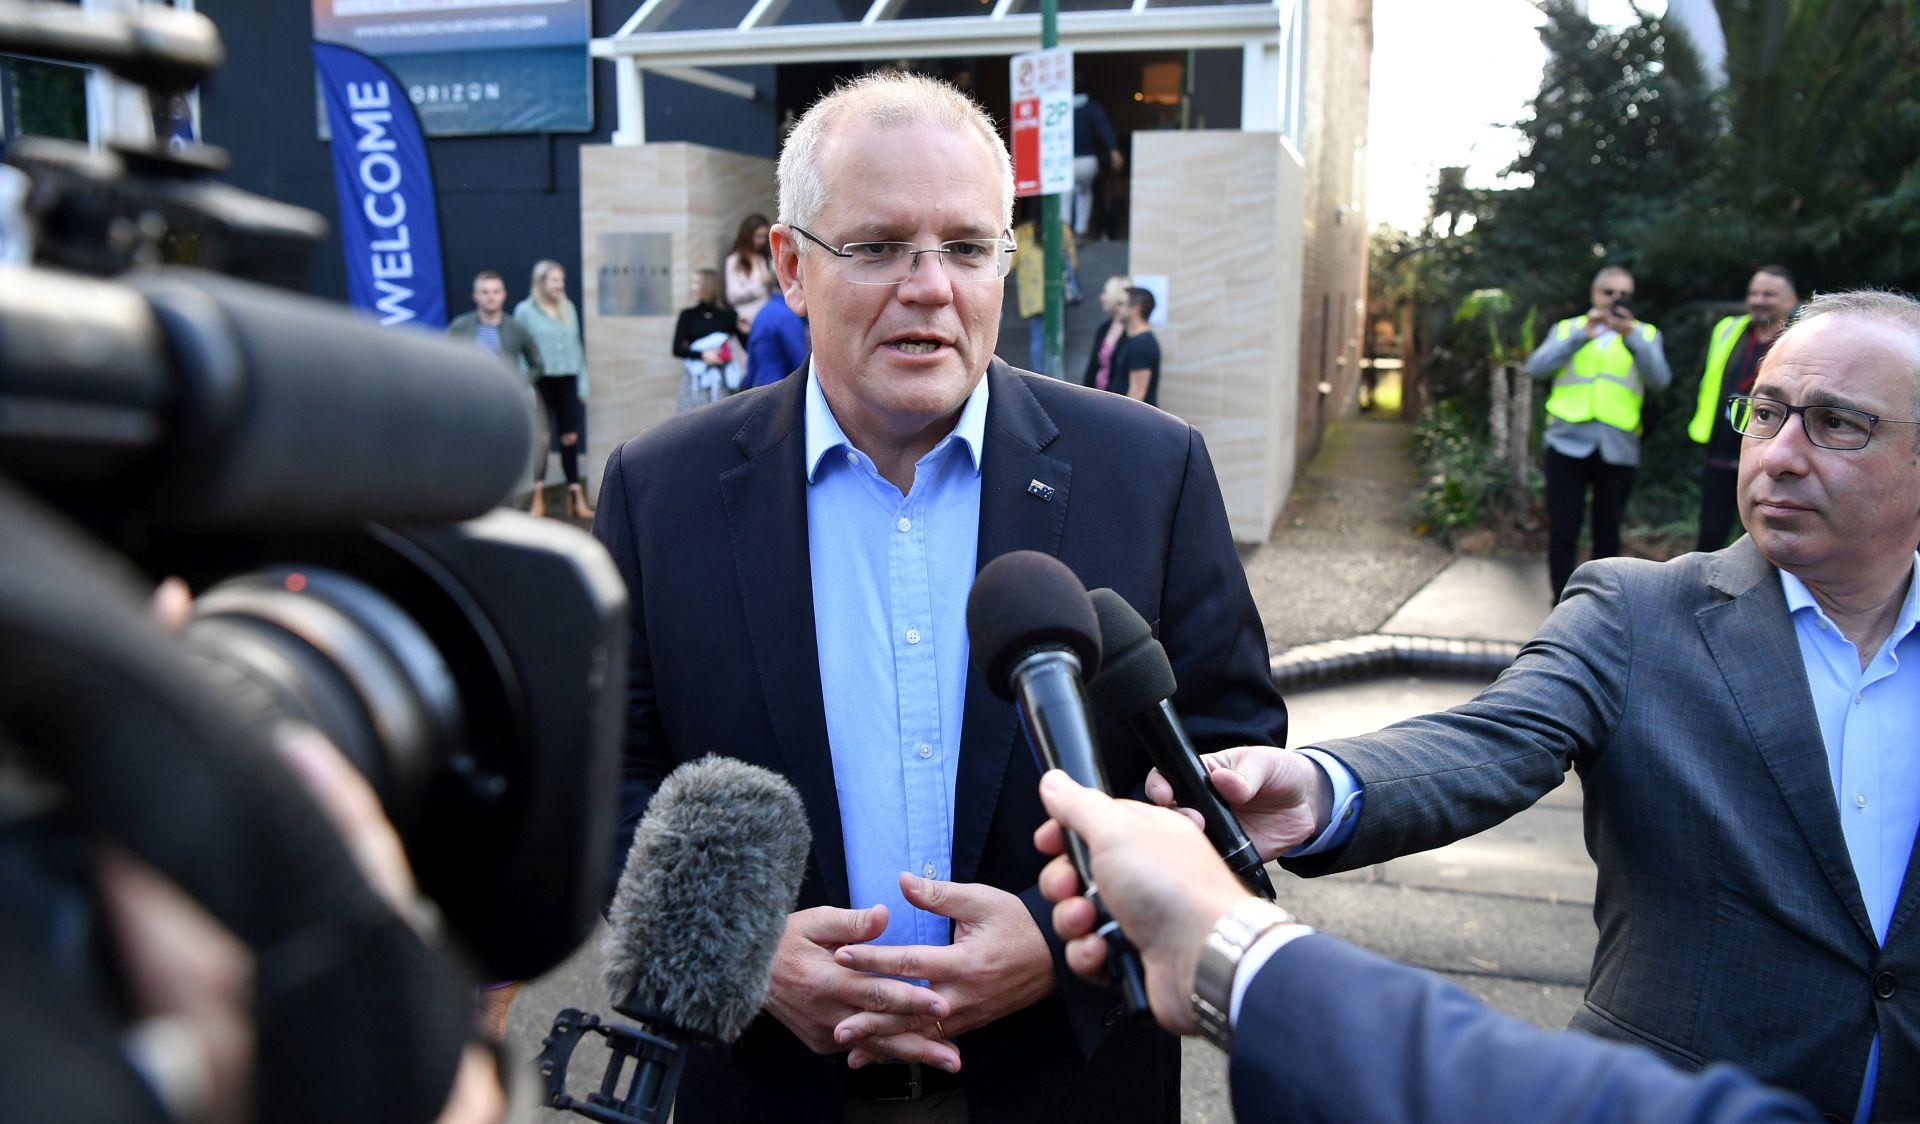 AUSTRALIJA Konzervativna koalicija osigurala većinu u parlamentu